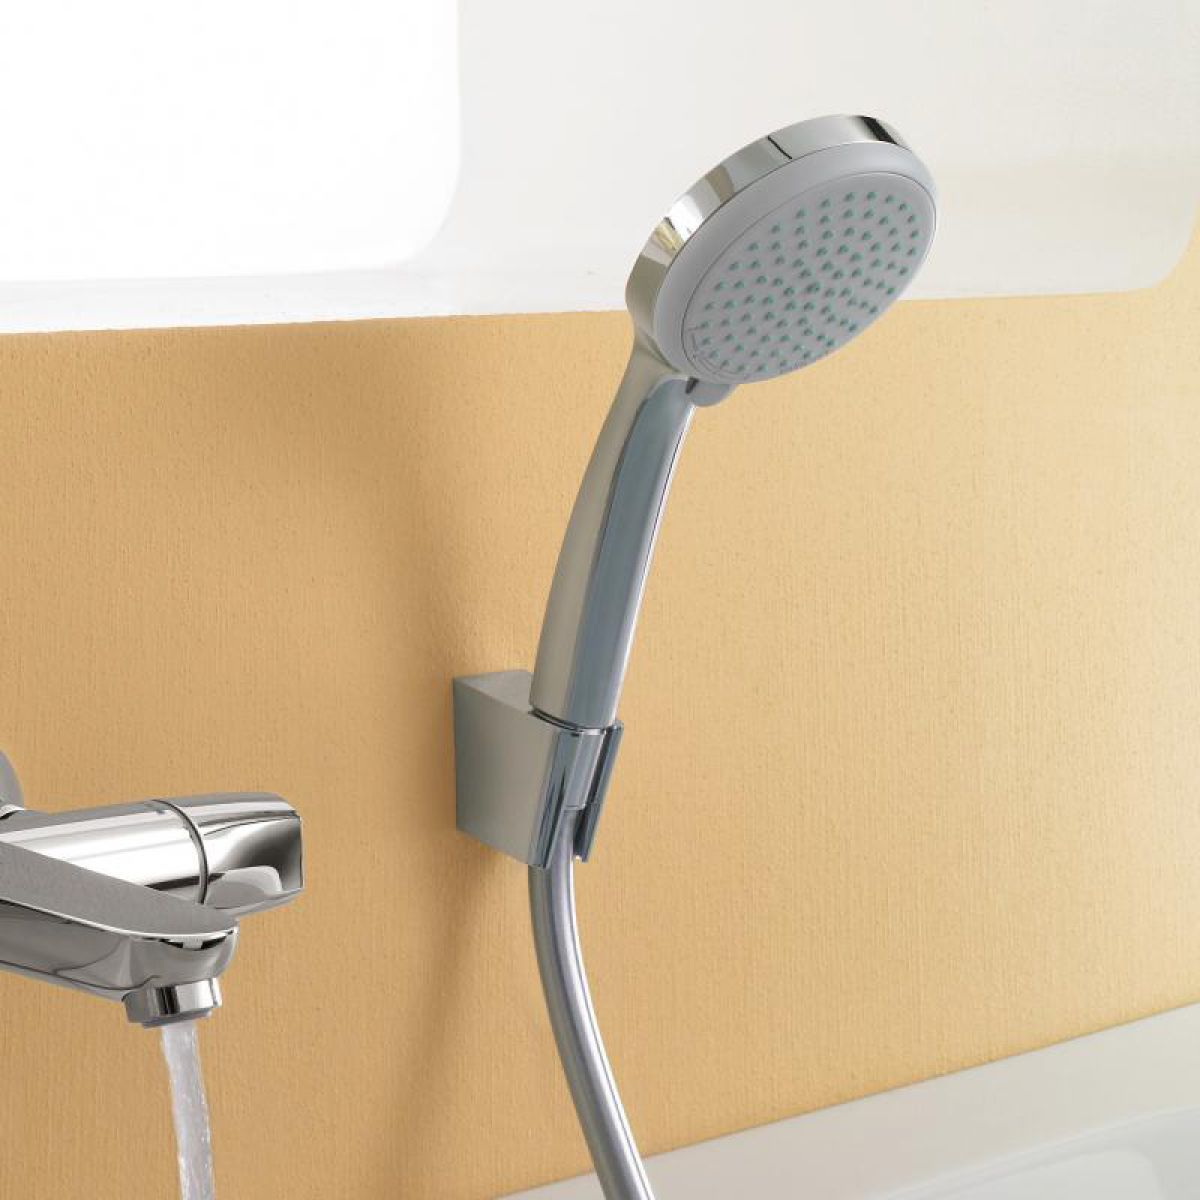 Turbo Hansgrohe Croma 100 Porter S Shower Handset : UK Bathrooms DO43